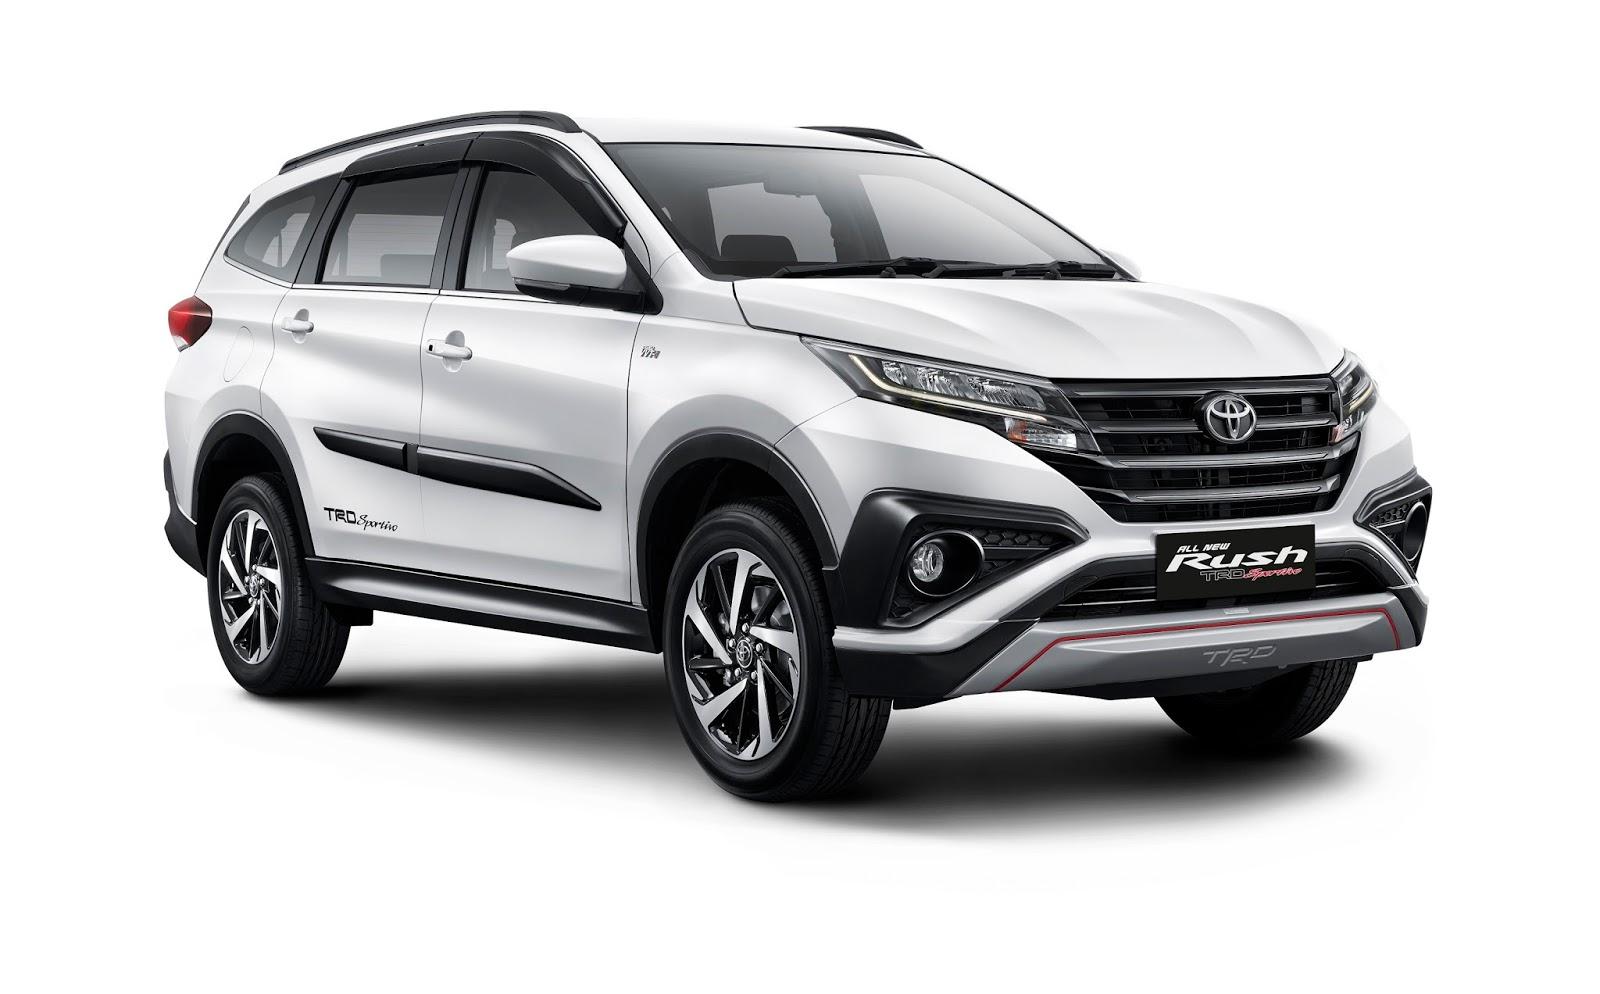 Harga All New Yaris Trd Sportivo 2018 Grand Avanza 1.3 Veloz A/t Toyota Rush Model Baru Tak Naik Tipe Tertinggi